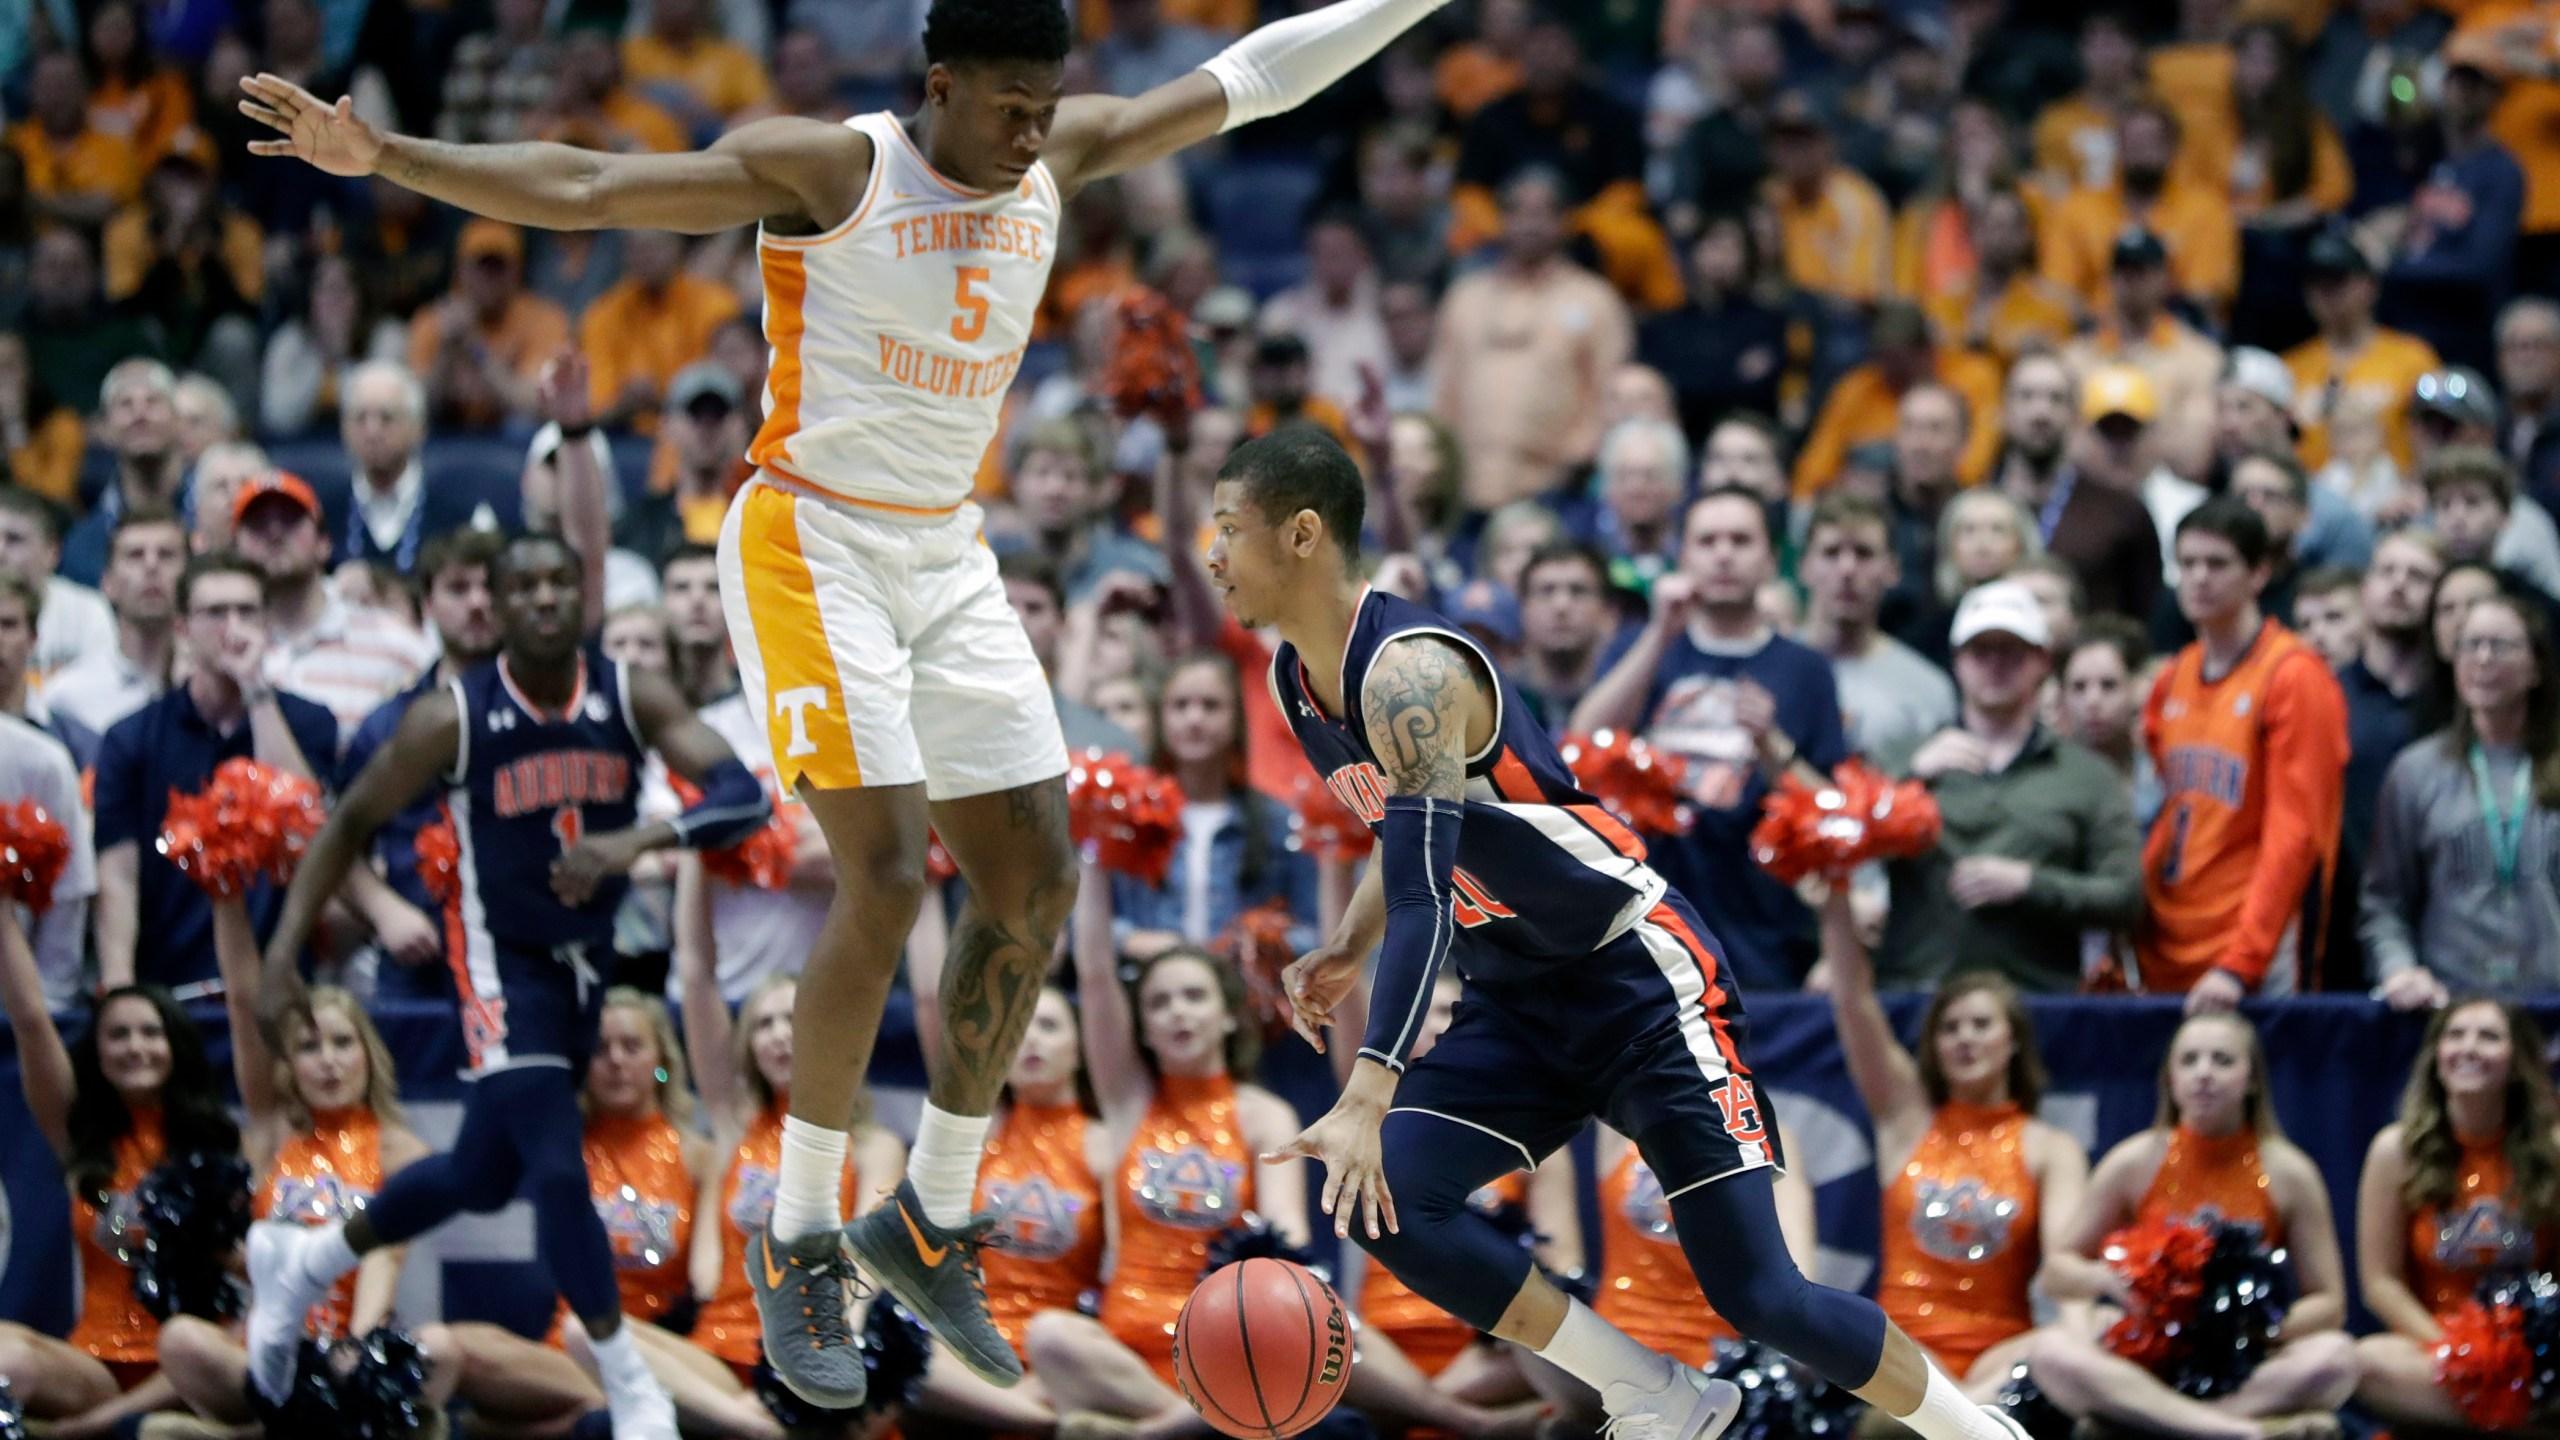 SEC Auburn Tennessee Basketball_1552848496822